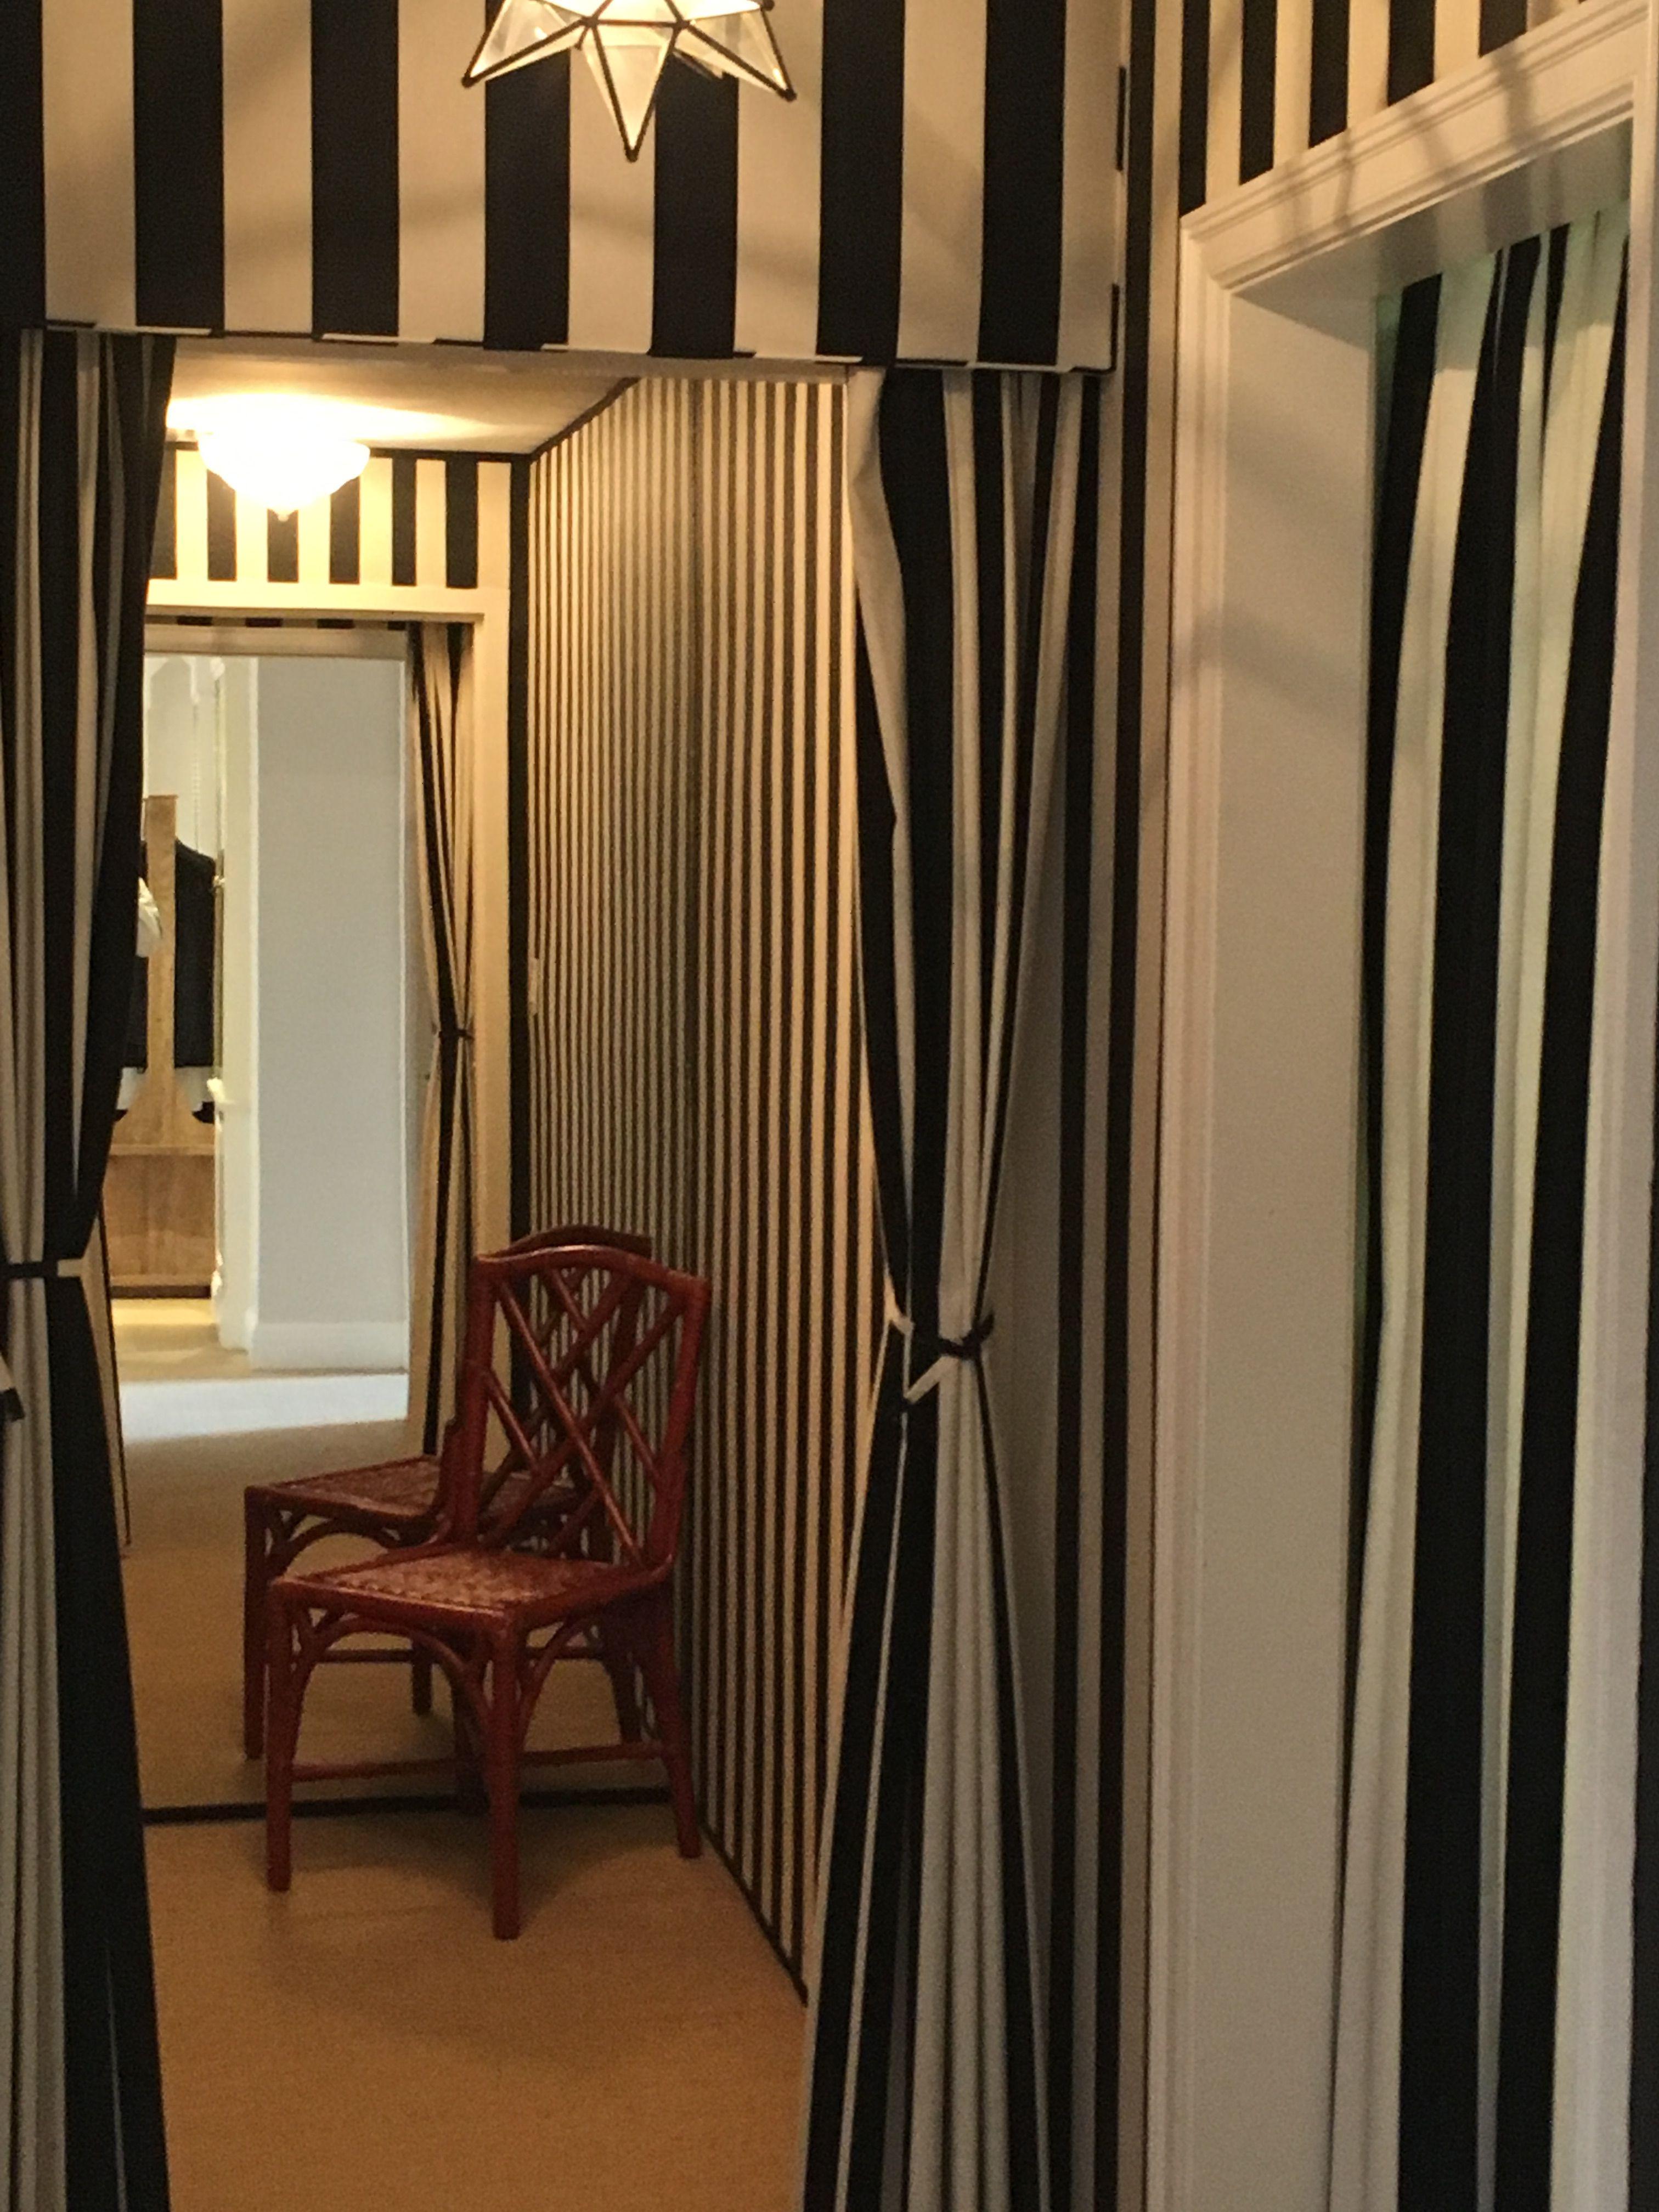 Palm Beach Dressing Room With Images Home Palm Beach Home Decor